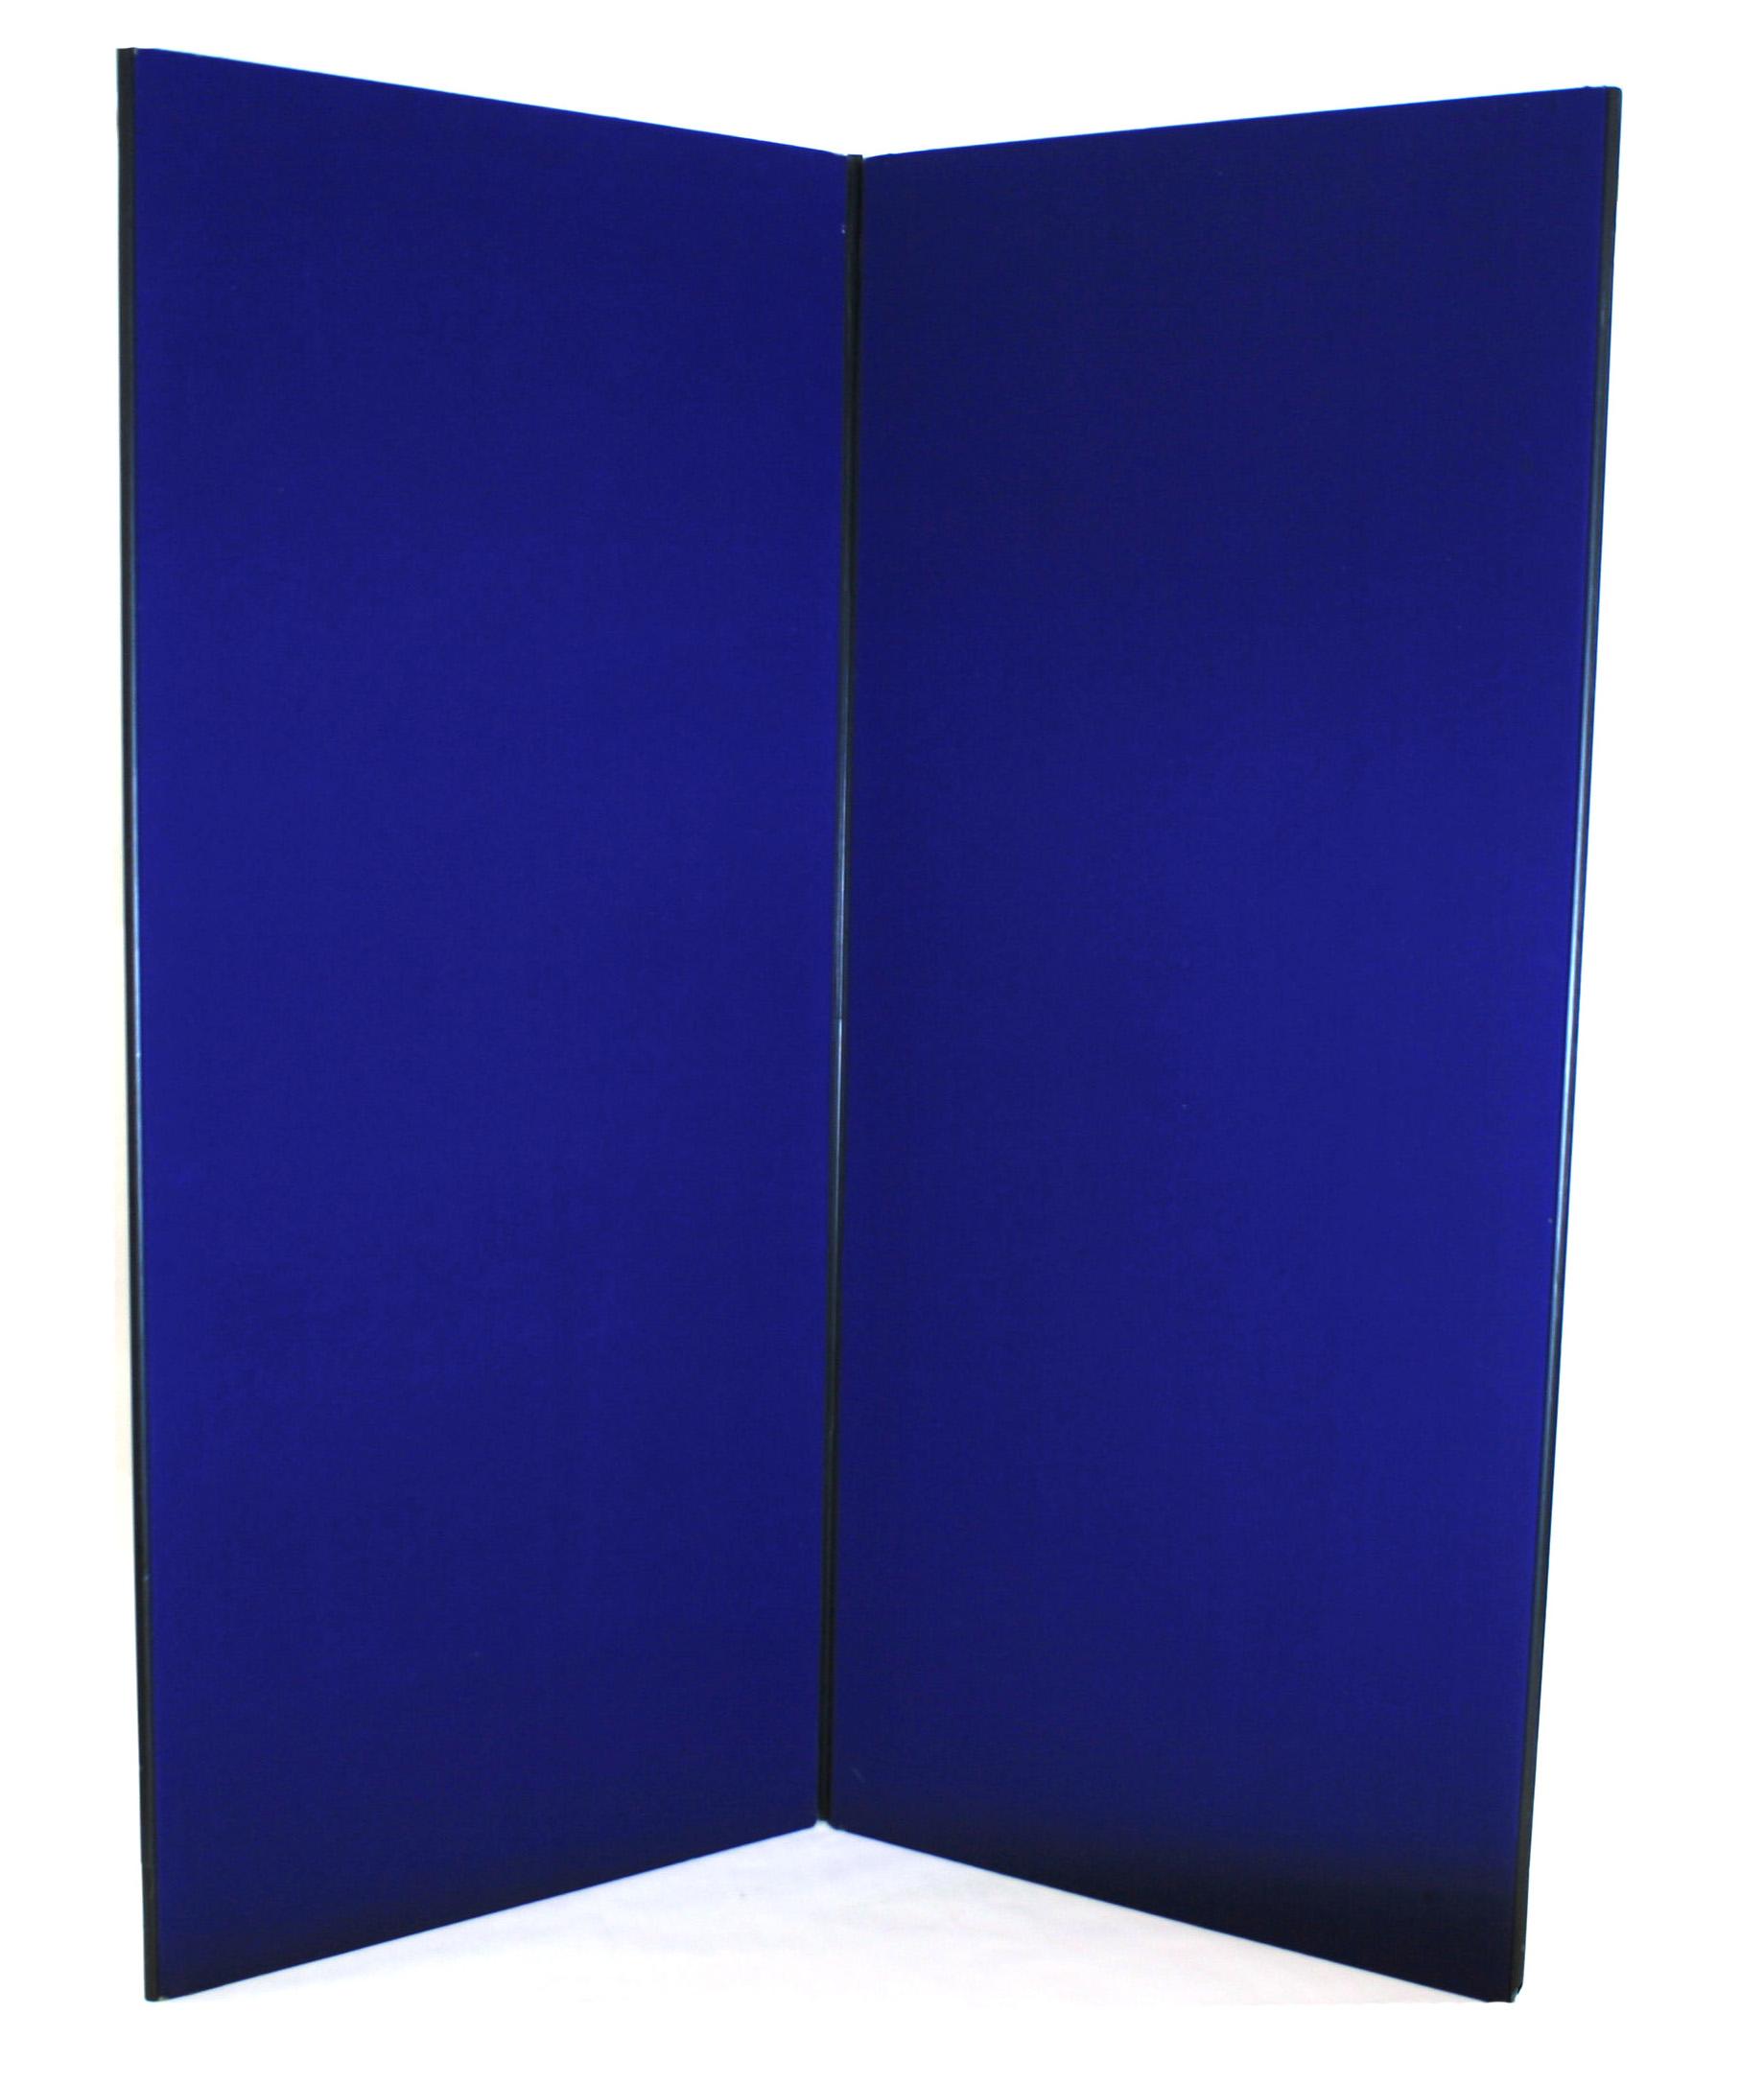 Exhibition panels 2m x 1 m - BE Event Hire